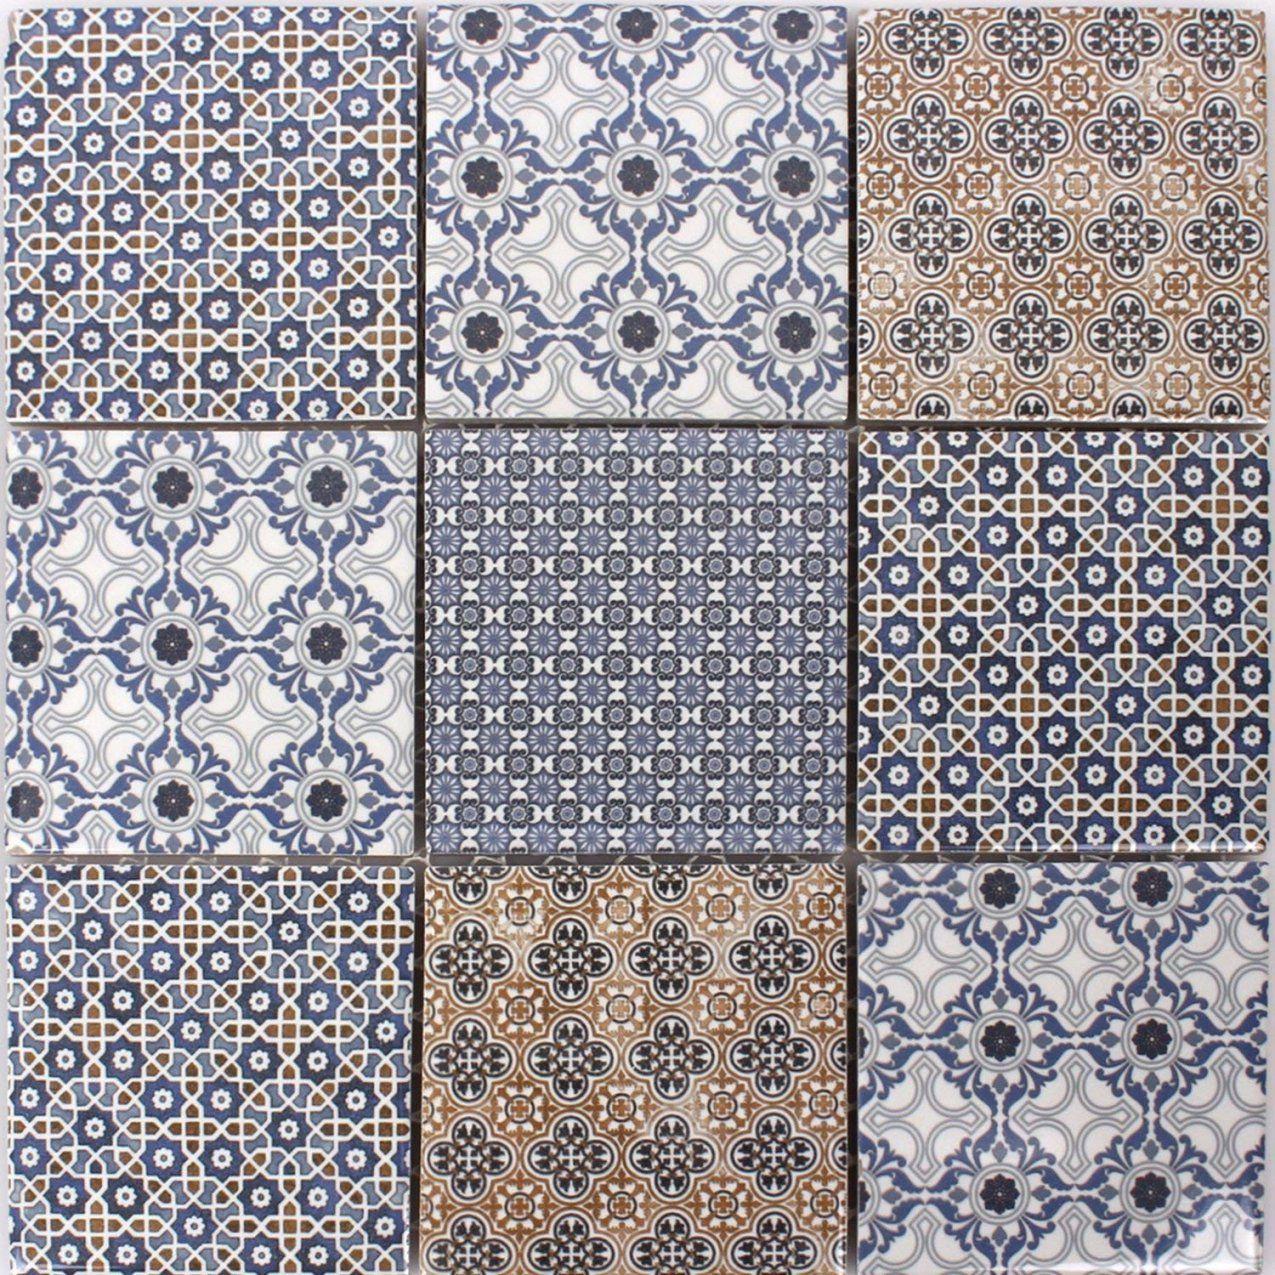 Mosaik Fliesen Zum Aufkleben Latest Optimal Badezimmer Fliesen von Mosaik Fliesen Zum Aufkleben Photo